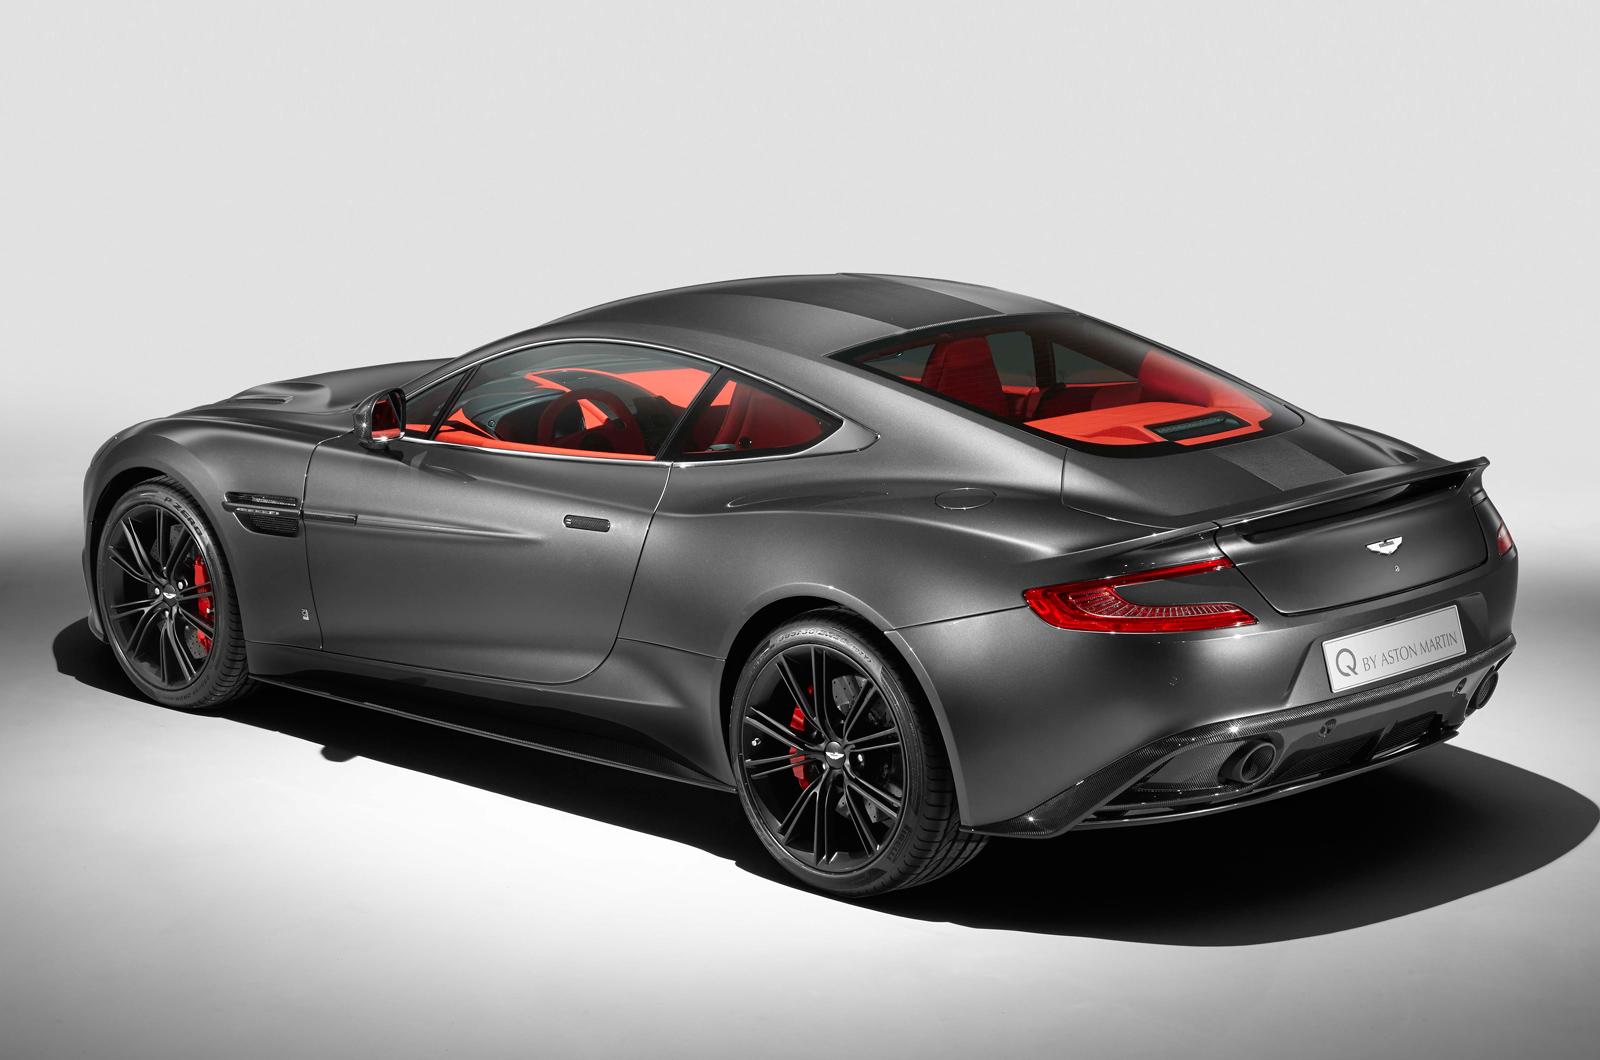 2012 - [Aston Martin] Vanquish [310] - Page 6 Aston-vanquish-q-1-6